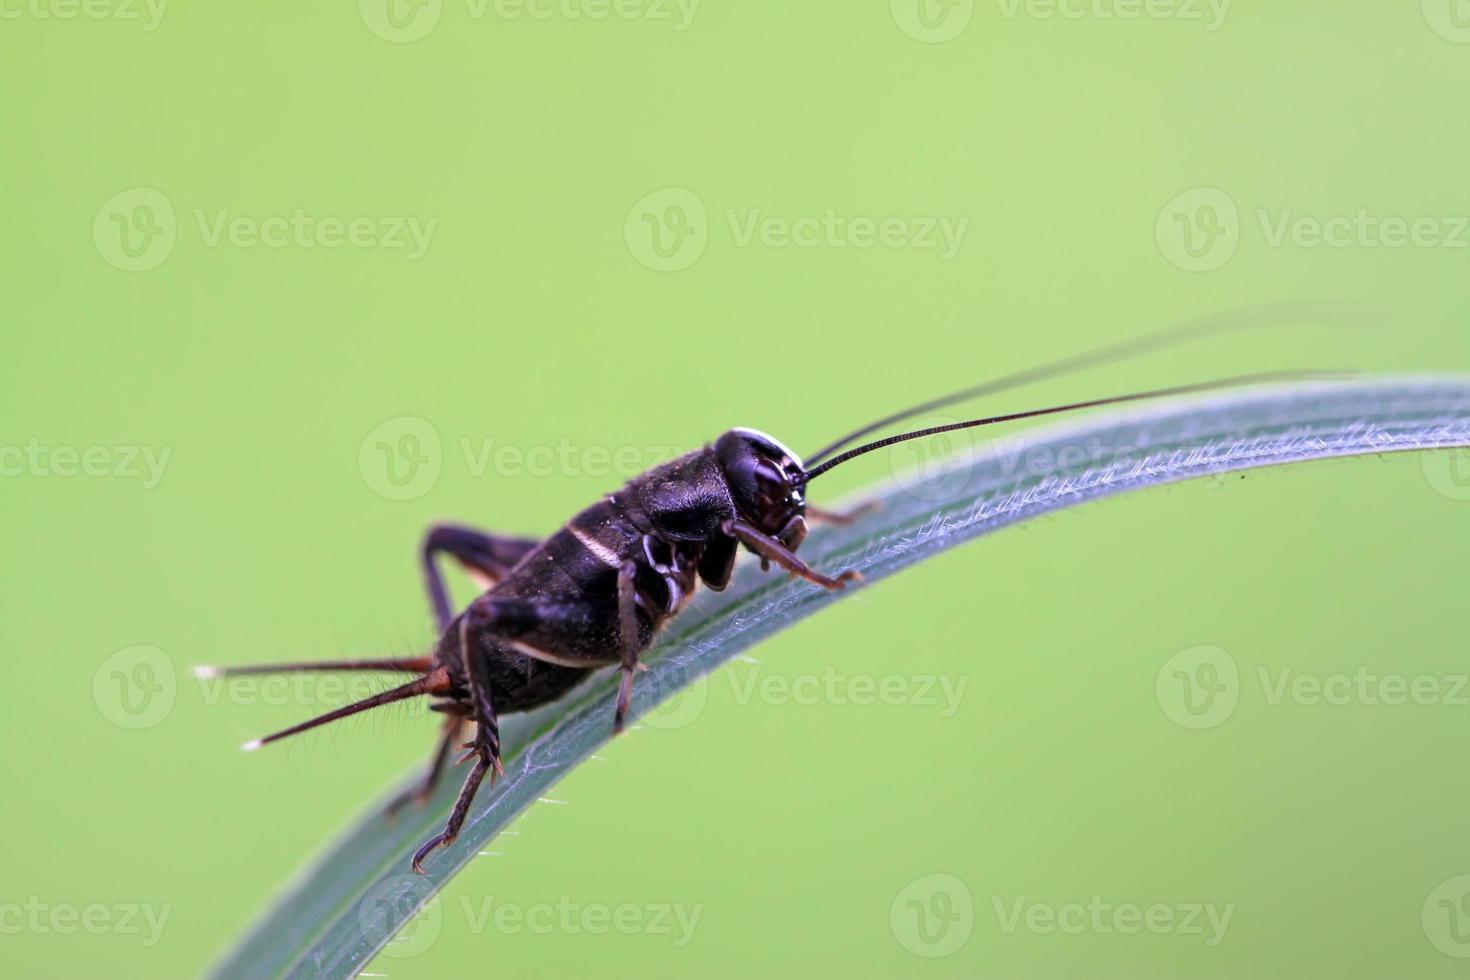 cricket nymfer foto